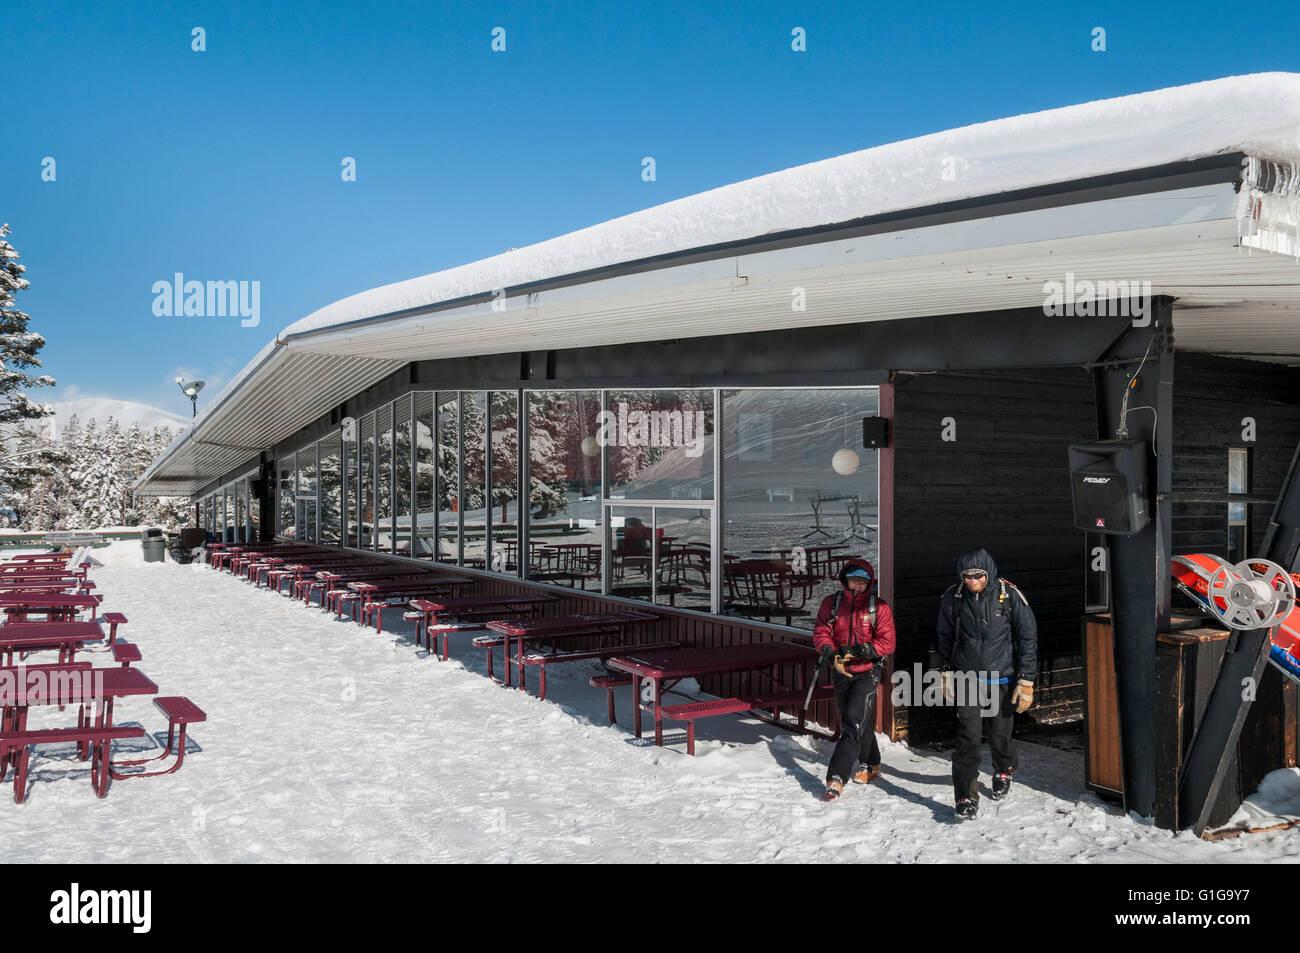 Merry-Go-Round midmountain day lodge, Aspen Highlands Ski Area, Aspen, Colorado. - Stock Image